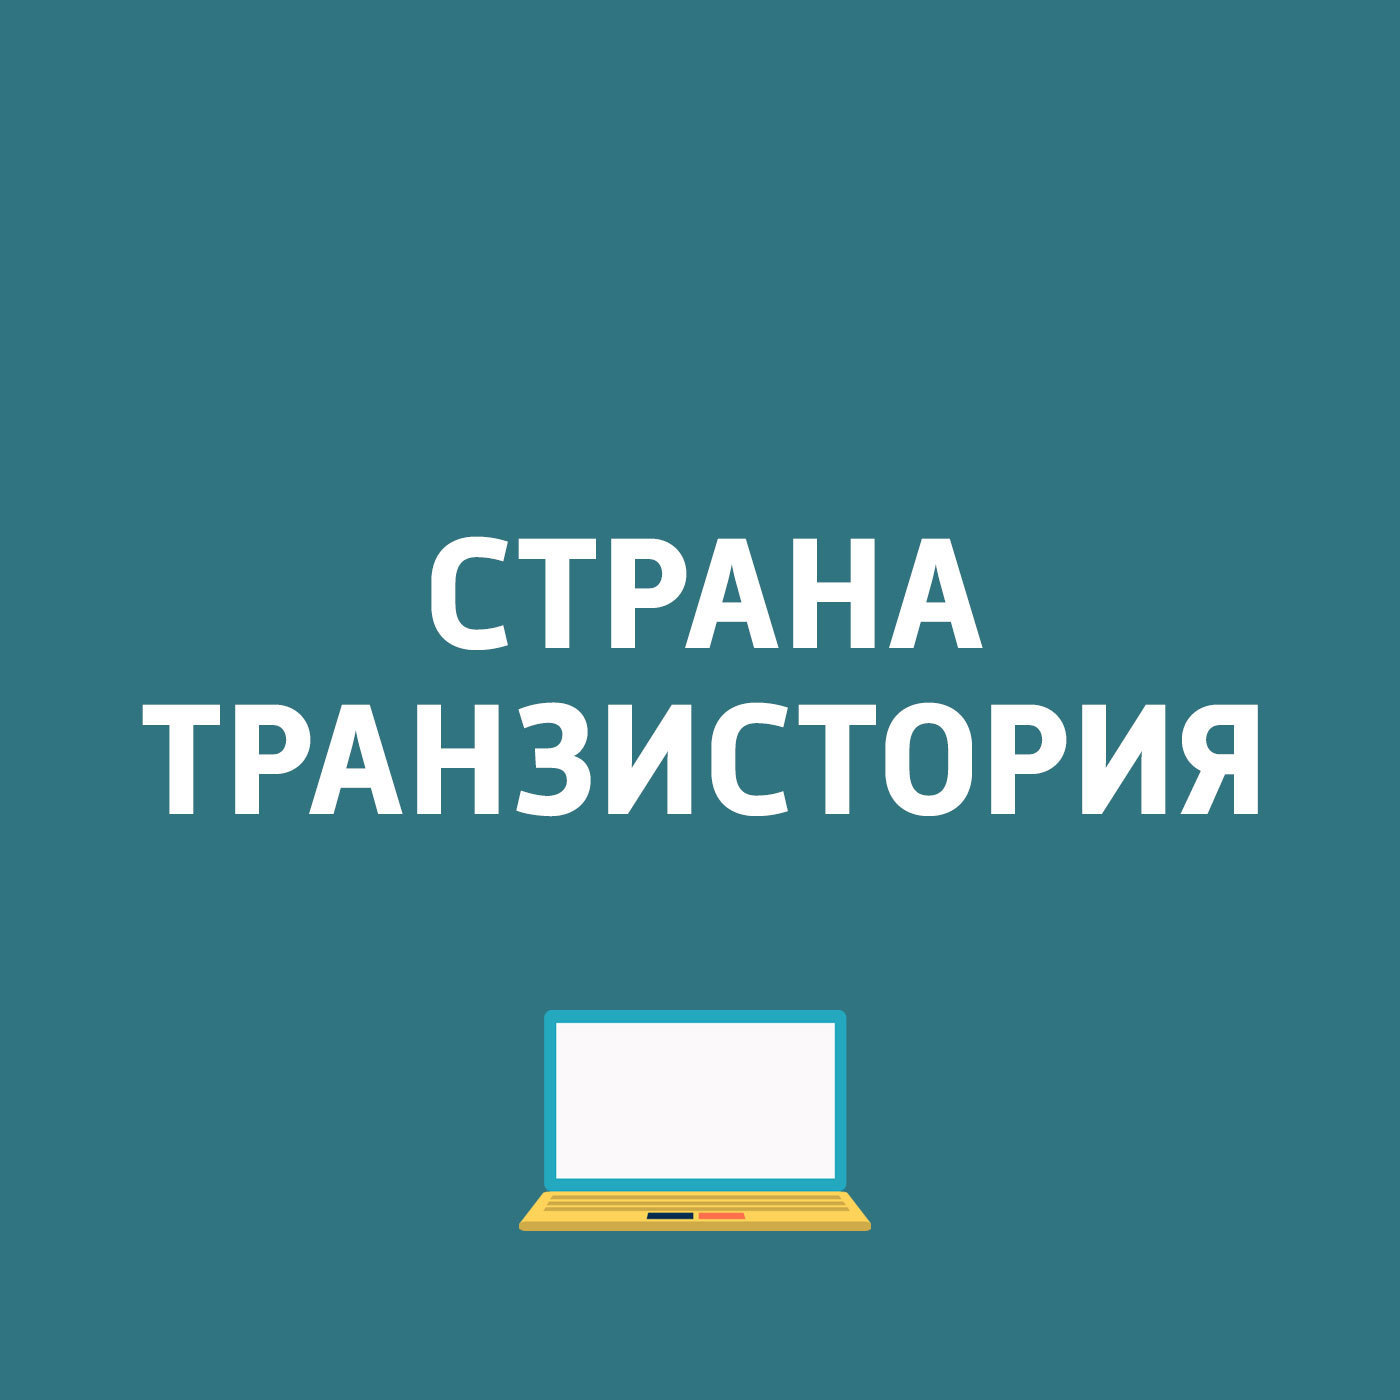 Картаев Павел Объявлена дата выхода квеста Syberia 3; Часы LG Watch Style и Watch Sport ... зу partner nokia 3310